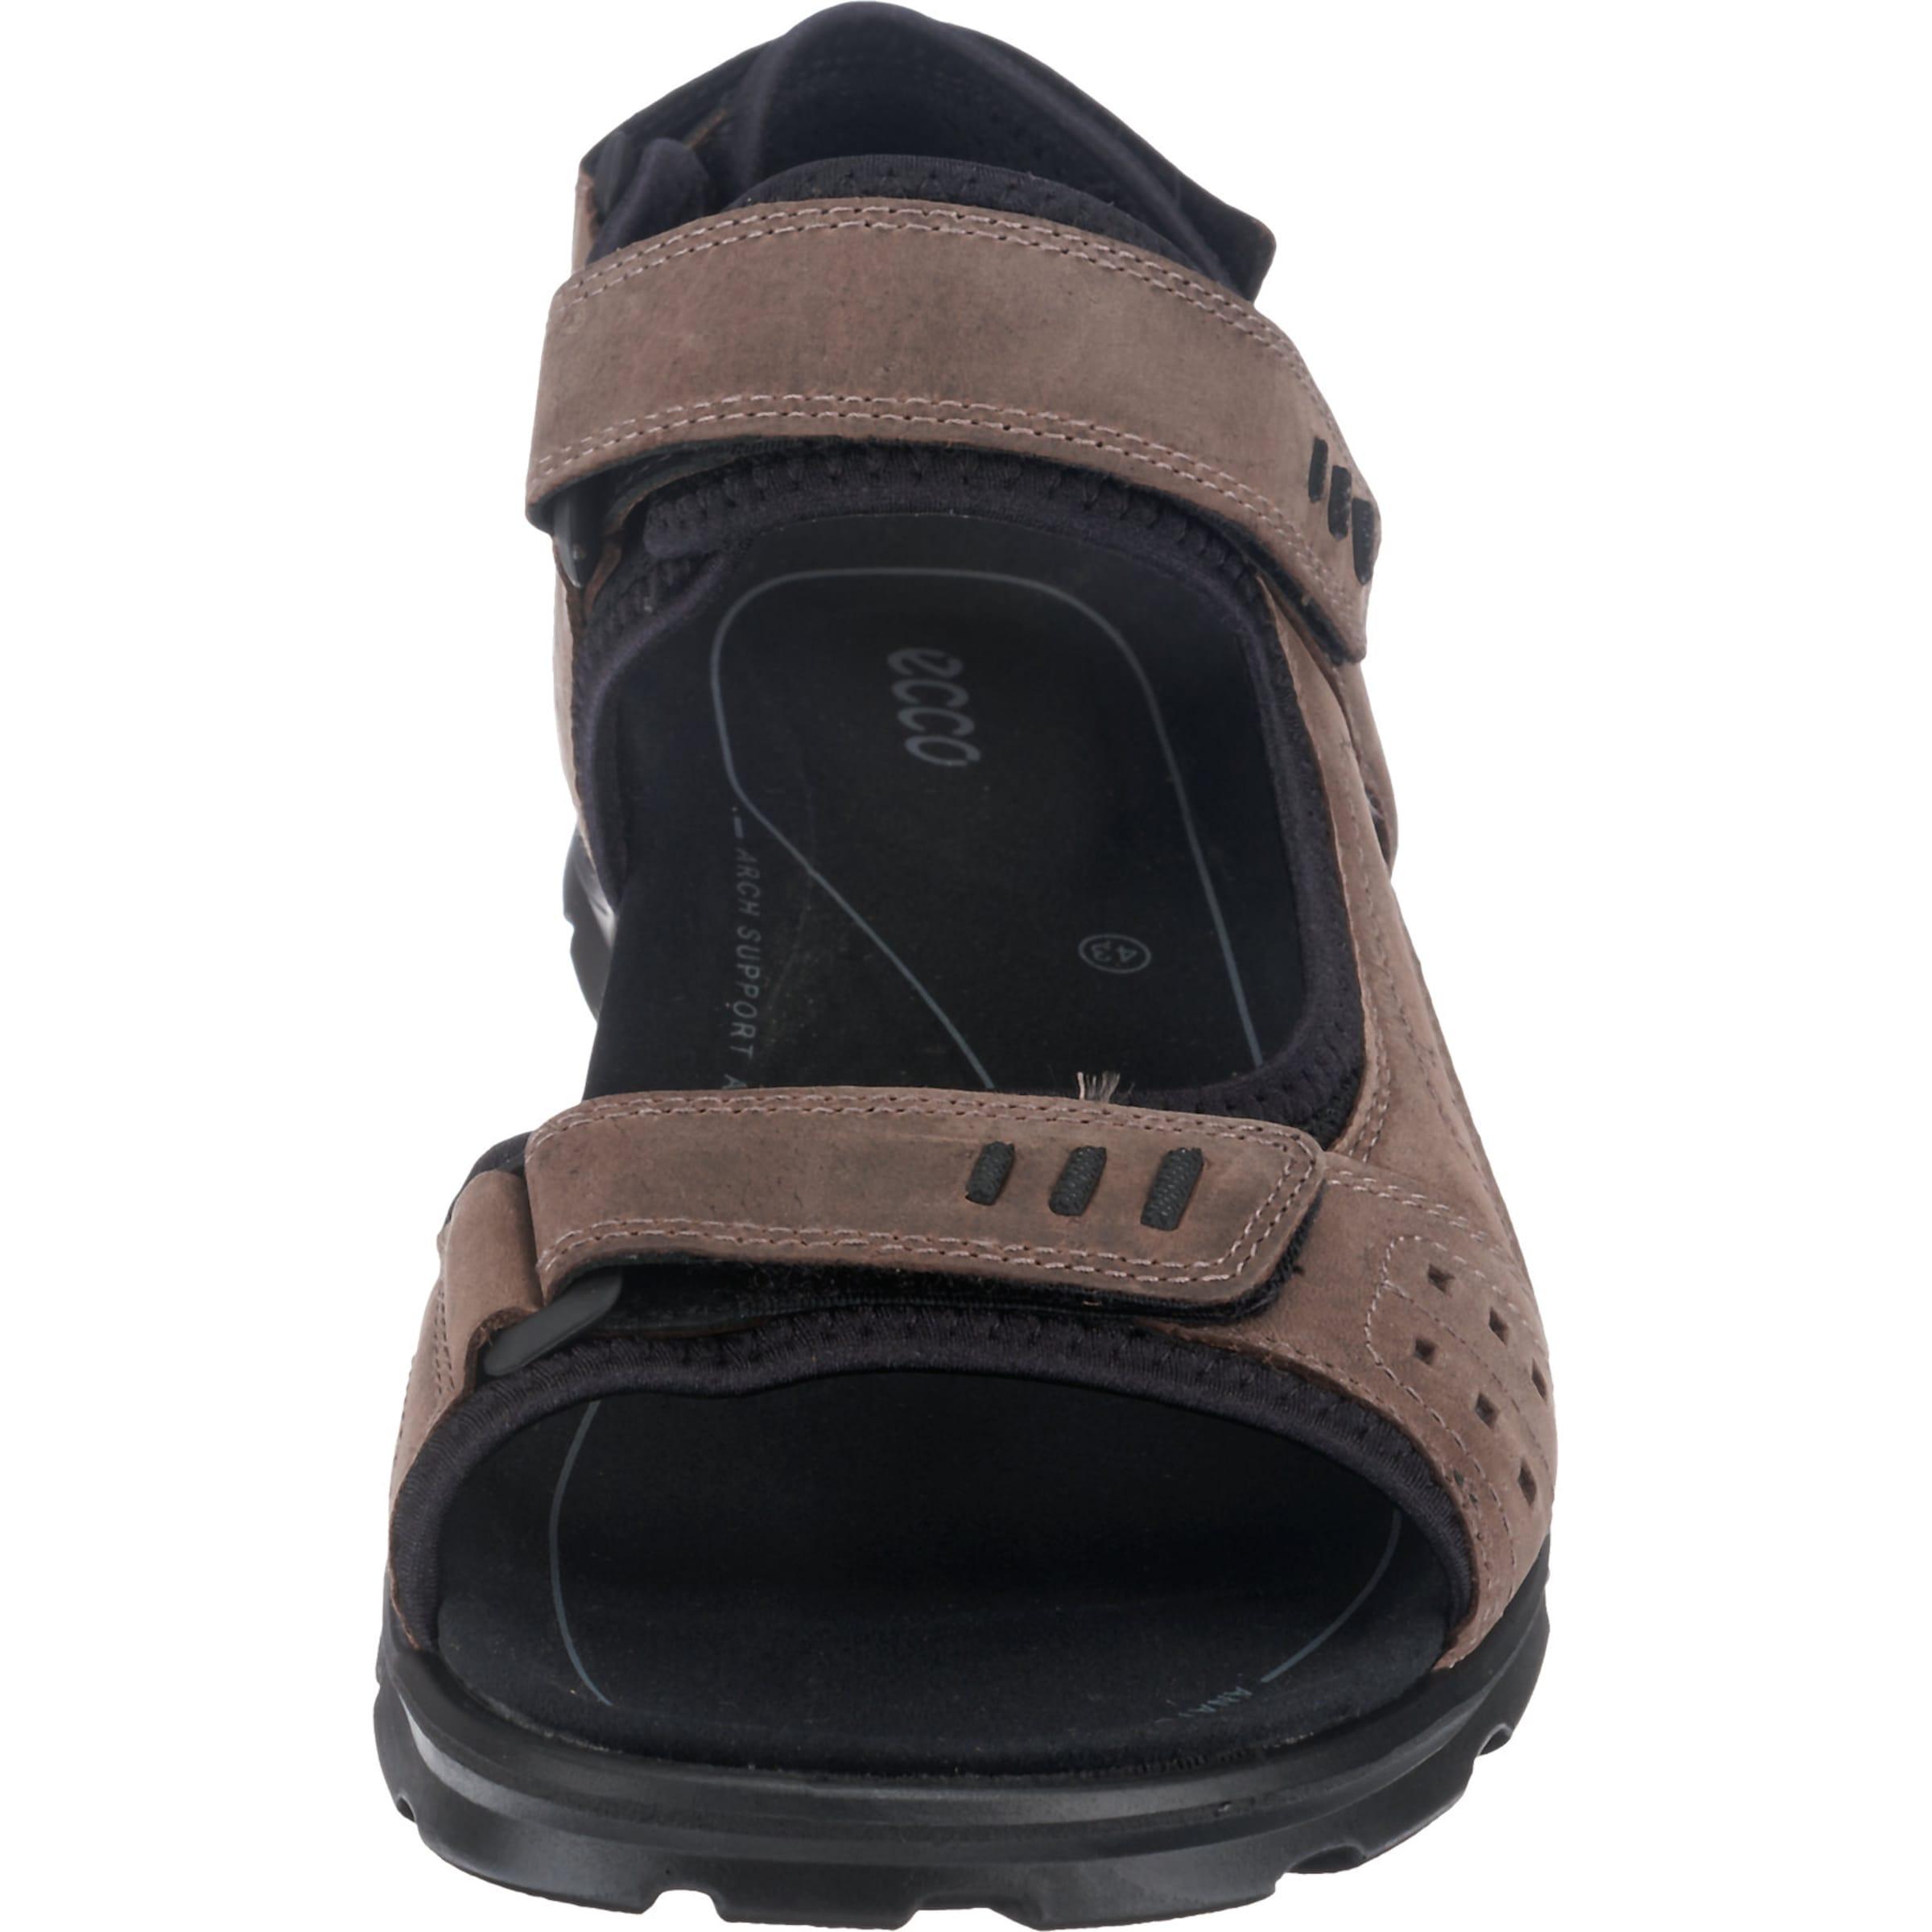 ECCO ECCO ECCO Sandalen 'Utah Leder Bequem, gut aussehend ad9077